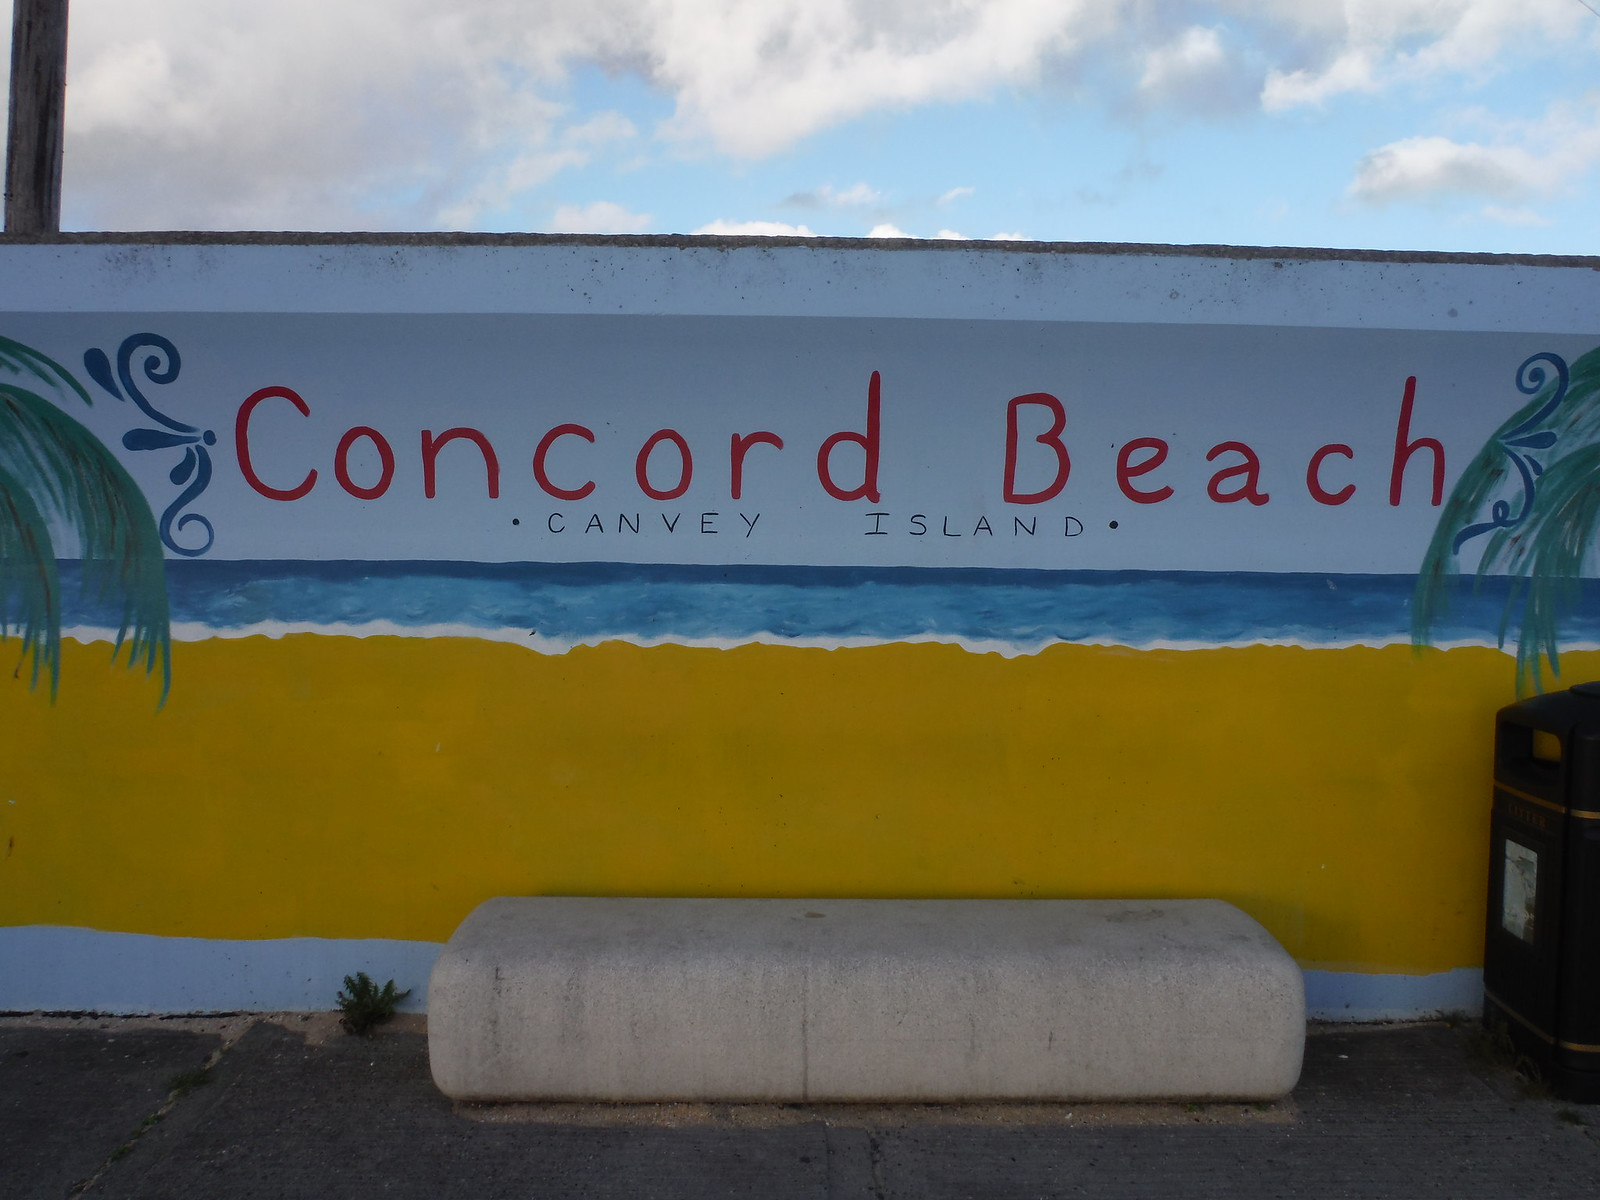 Concord Beach Mural, Canvey Island SWC Walk 258 Benfleet Circular (via Canvey Island)